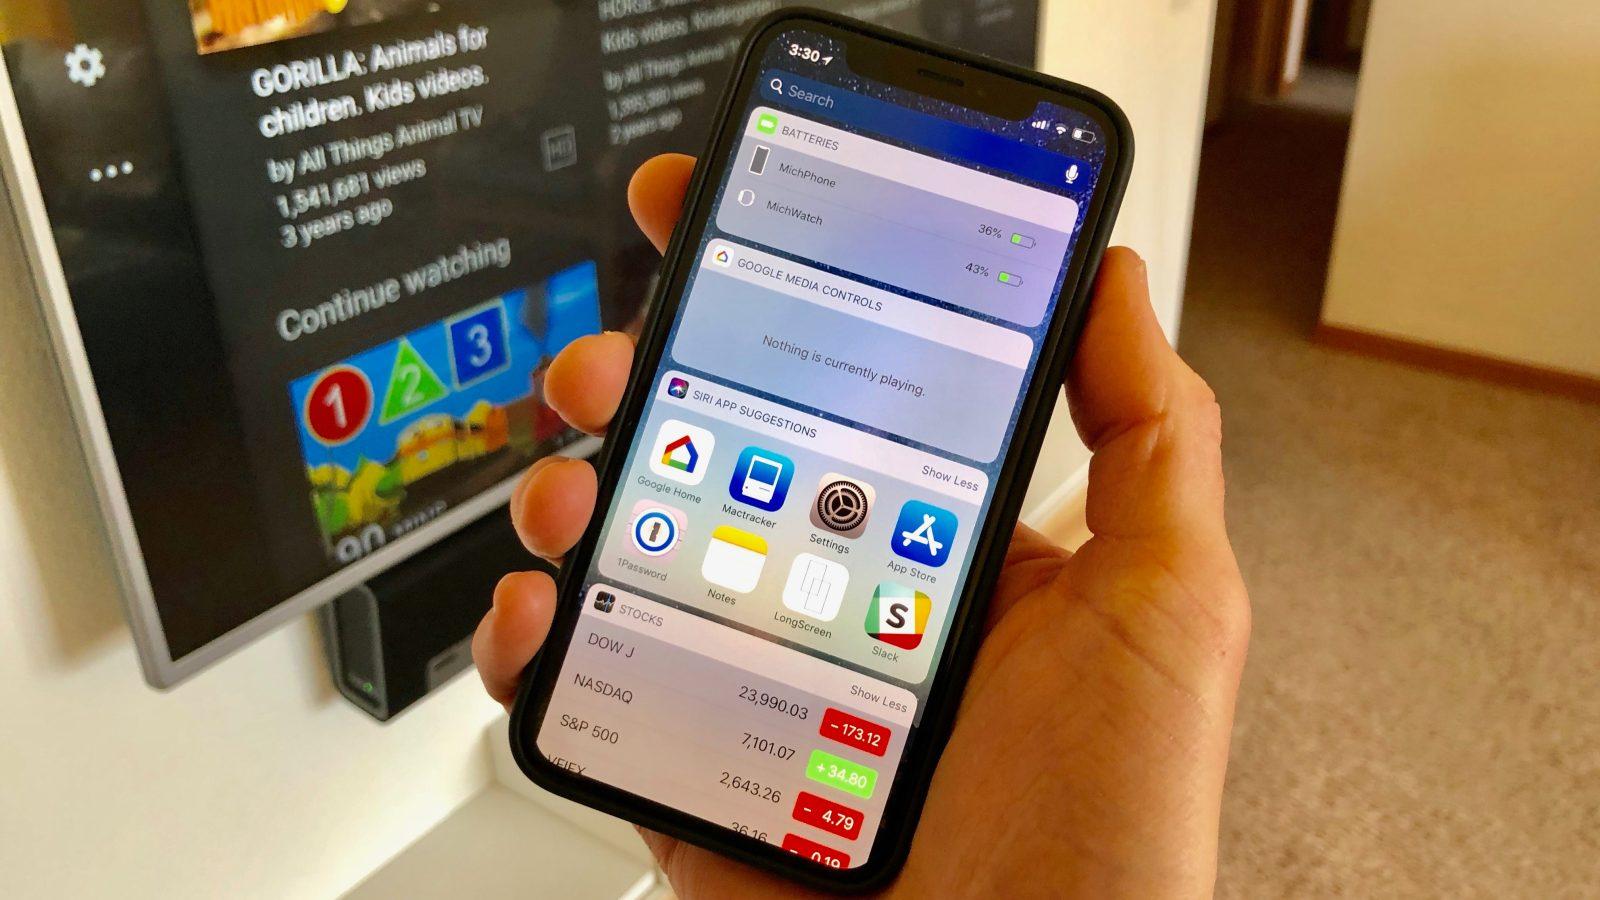 Google updates Home app for iOS with a Chromecast media